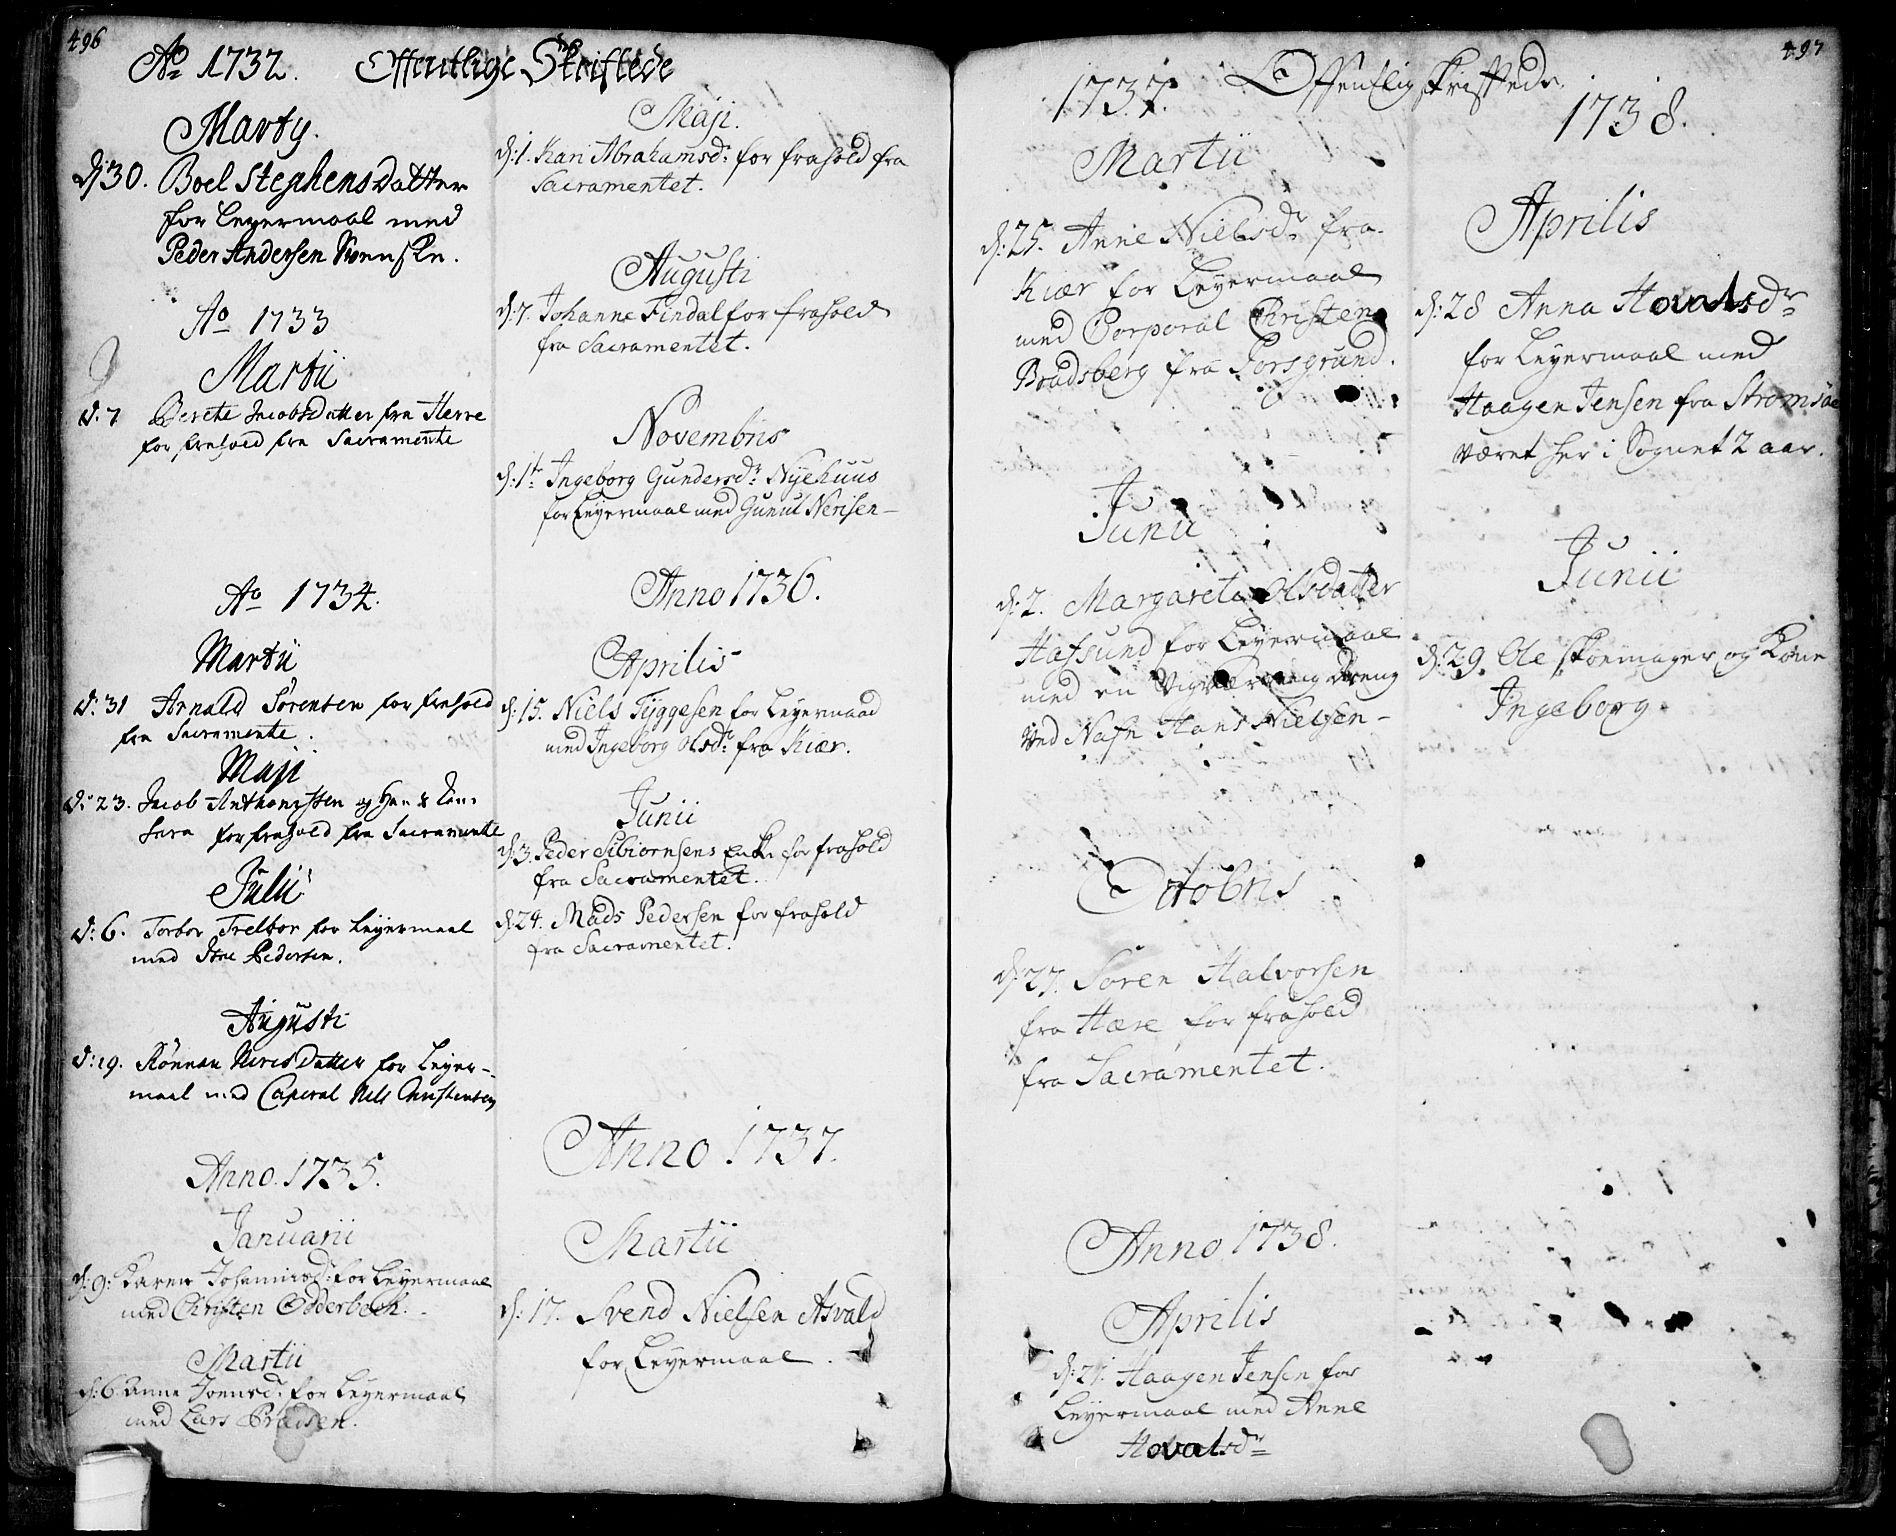 SAKO, Bamble kirkebøker, F/Fa/L0001: Ministerialbok nr. I 1, 1702-1774, s. 496-497